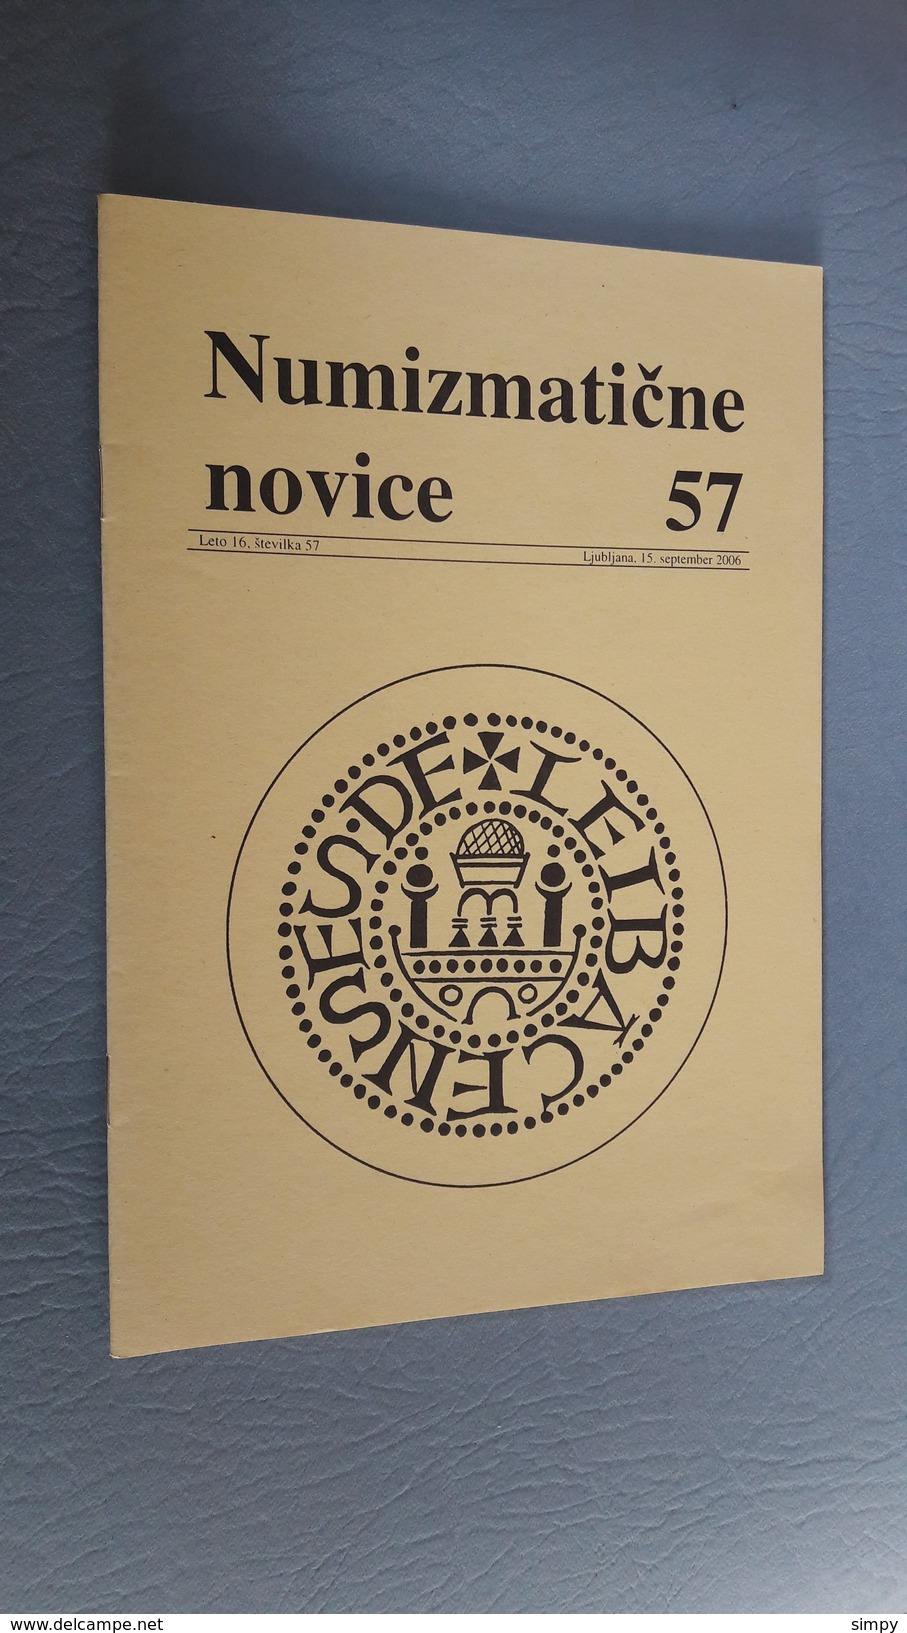 Slovenia Numismatic Bulletin Numizmaticne Novice 57 Ljubljana 2006 - Magazines: Abonnements